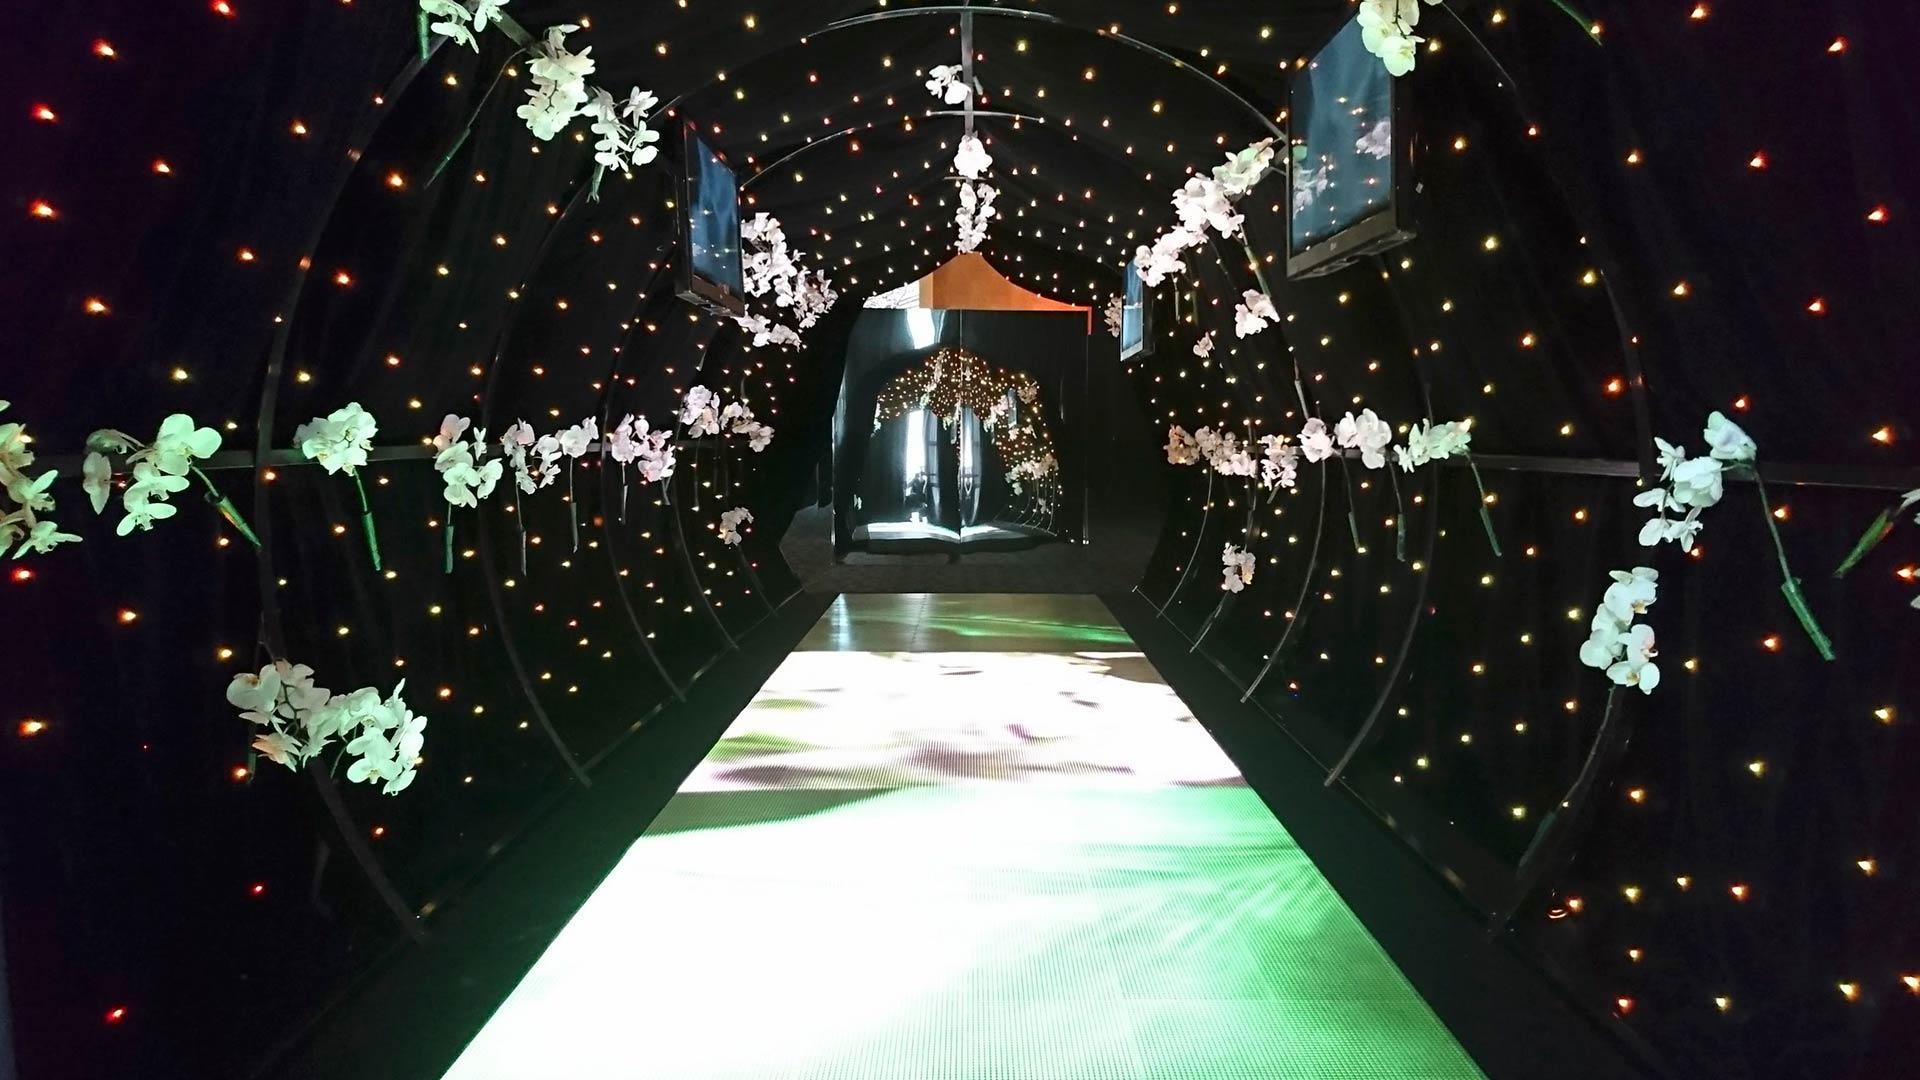 Chanel perfume presentation event. led tunnel design